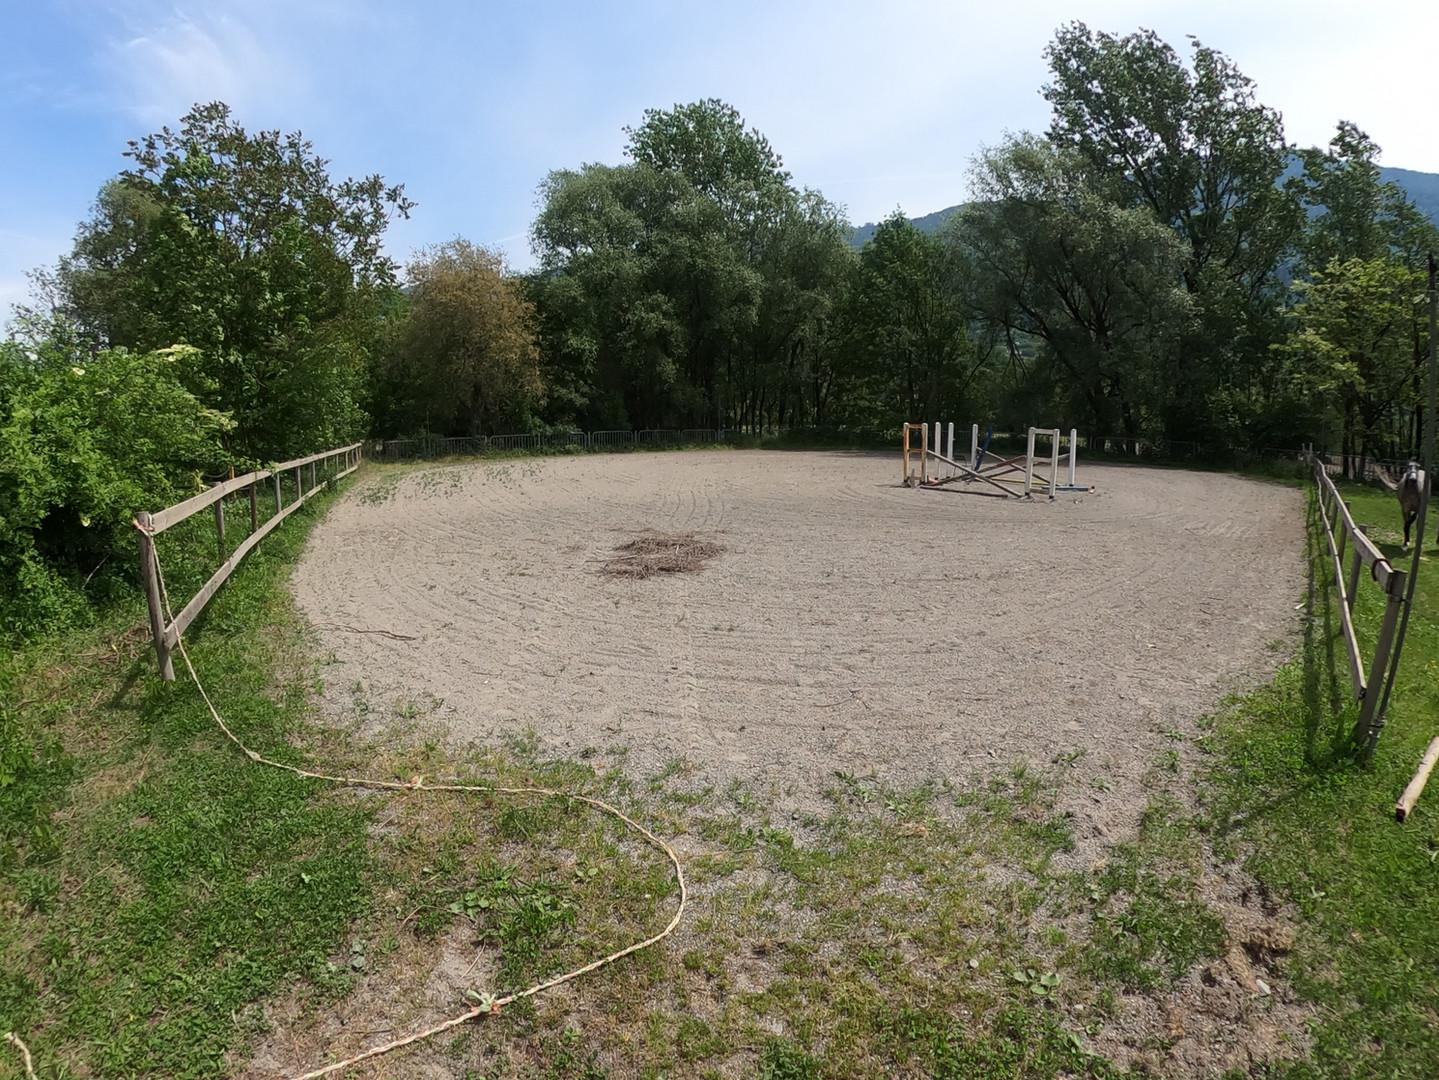 Campo esterno in sabbia